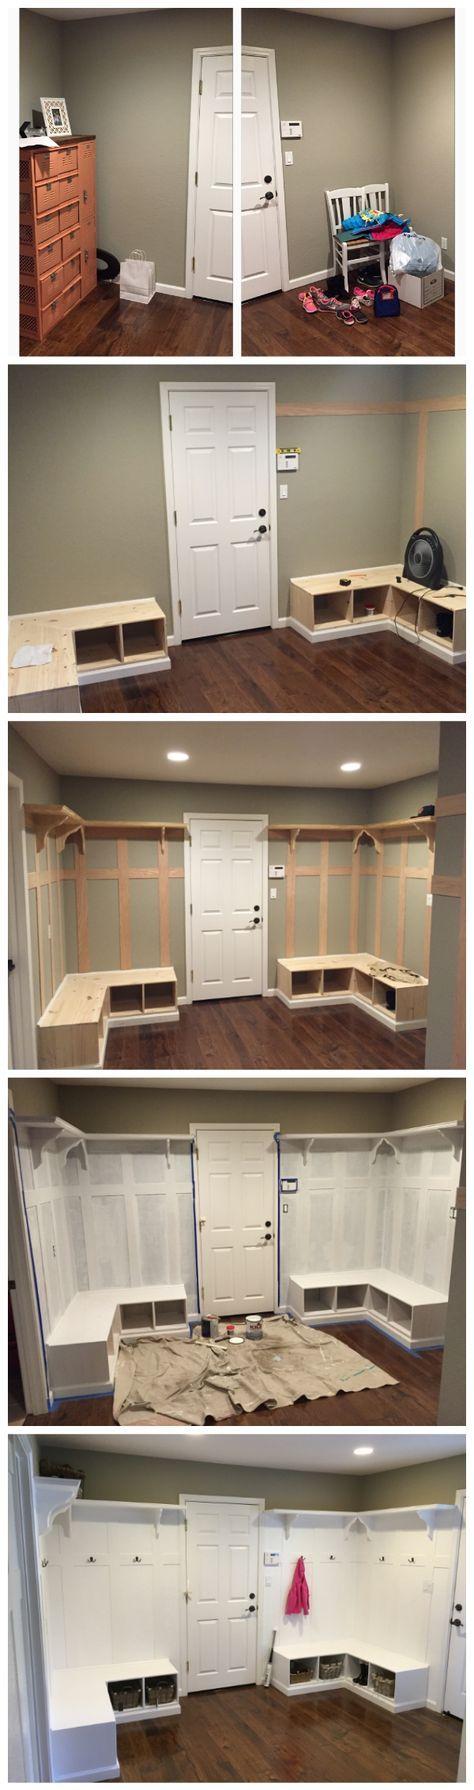 Joanna gaines hallway decor  Mud Room Batten Board Bench Corner White Cubbies DYI Fixer